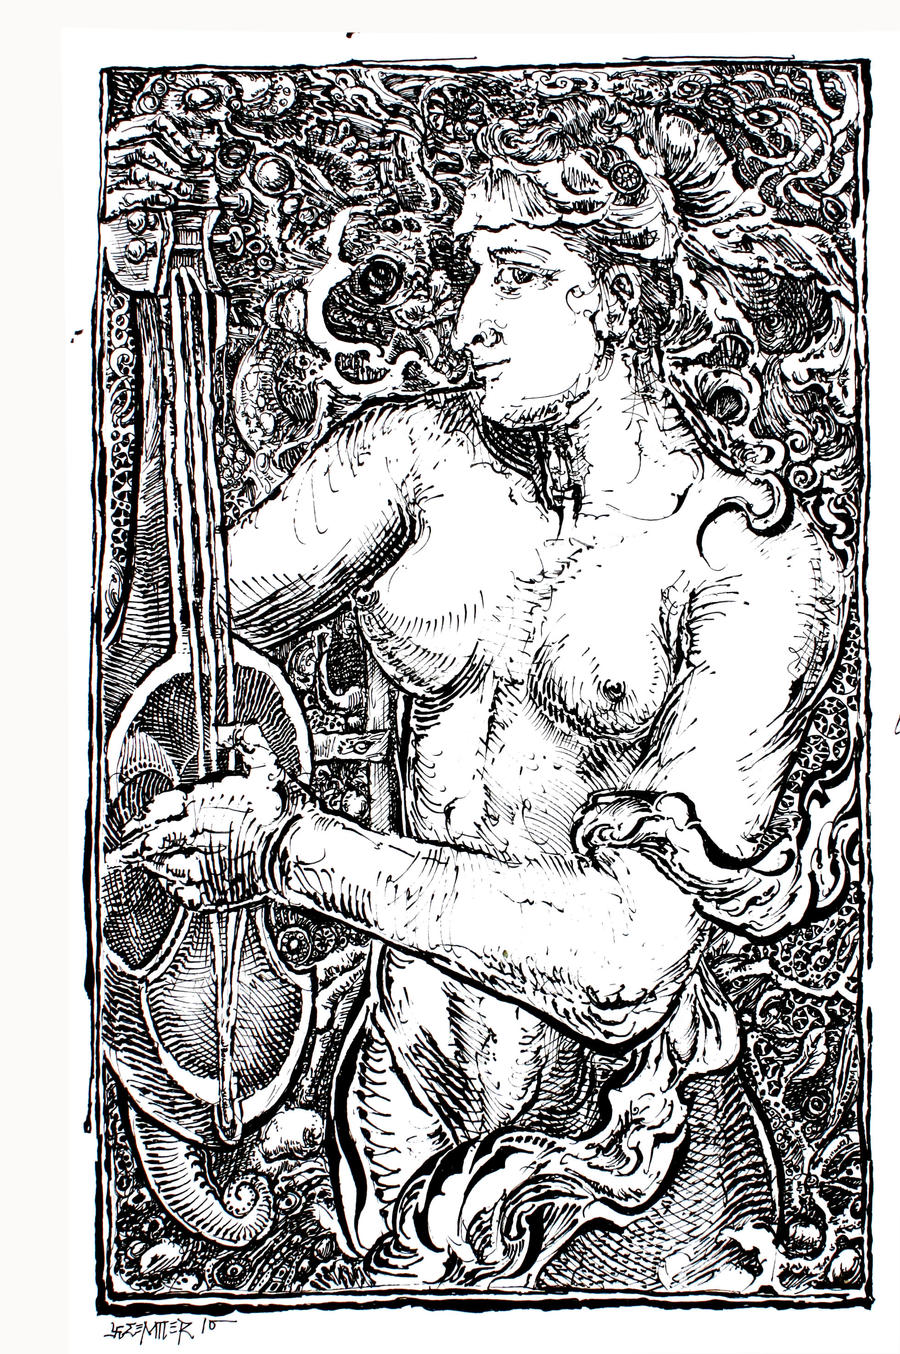 Calypso's Orphic Hymn by gromyko